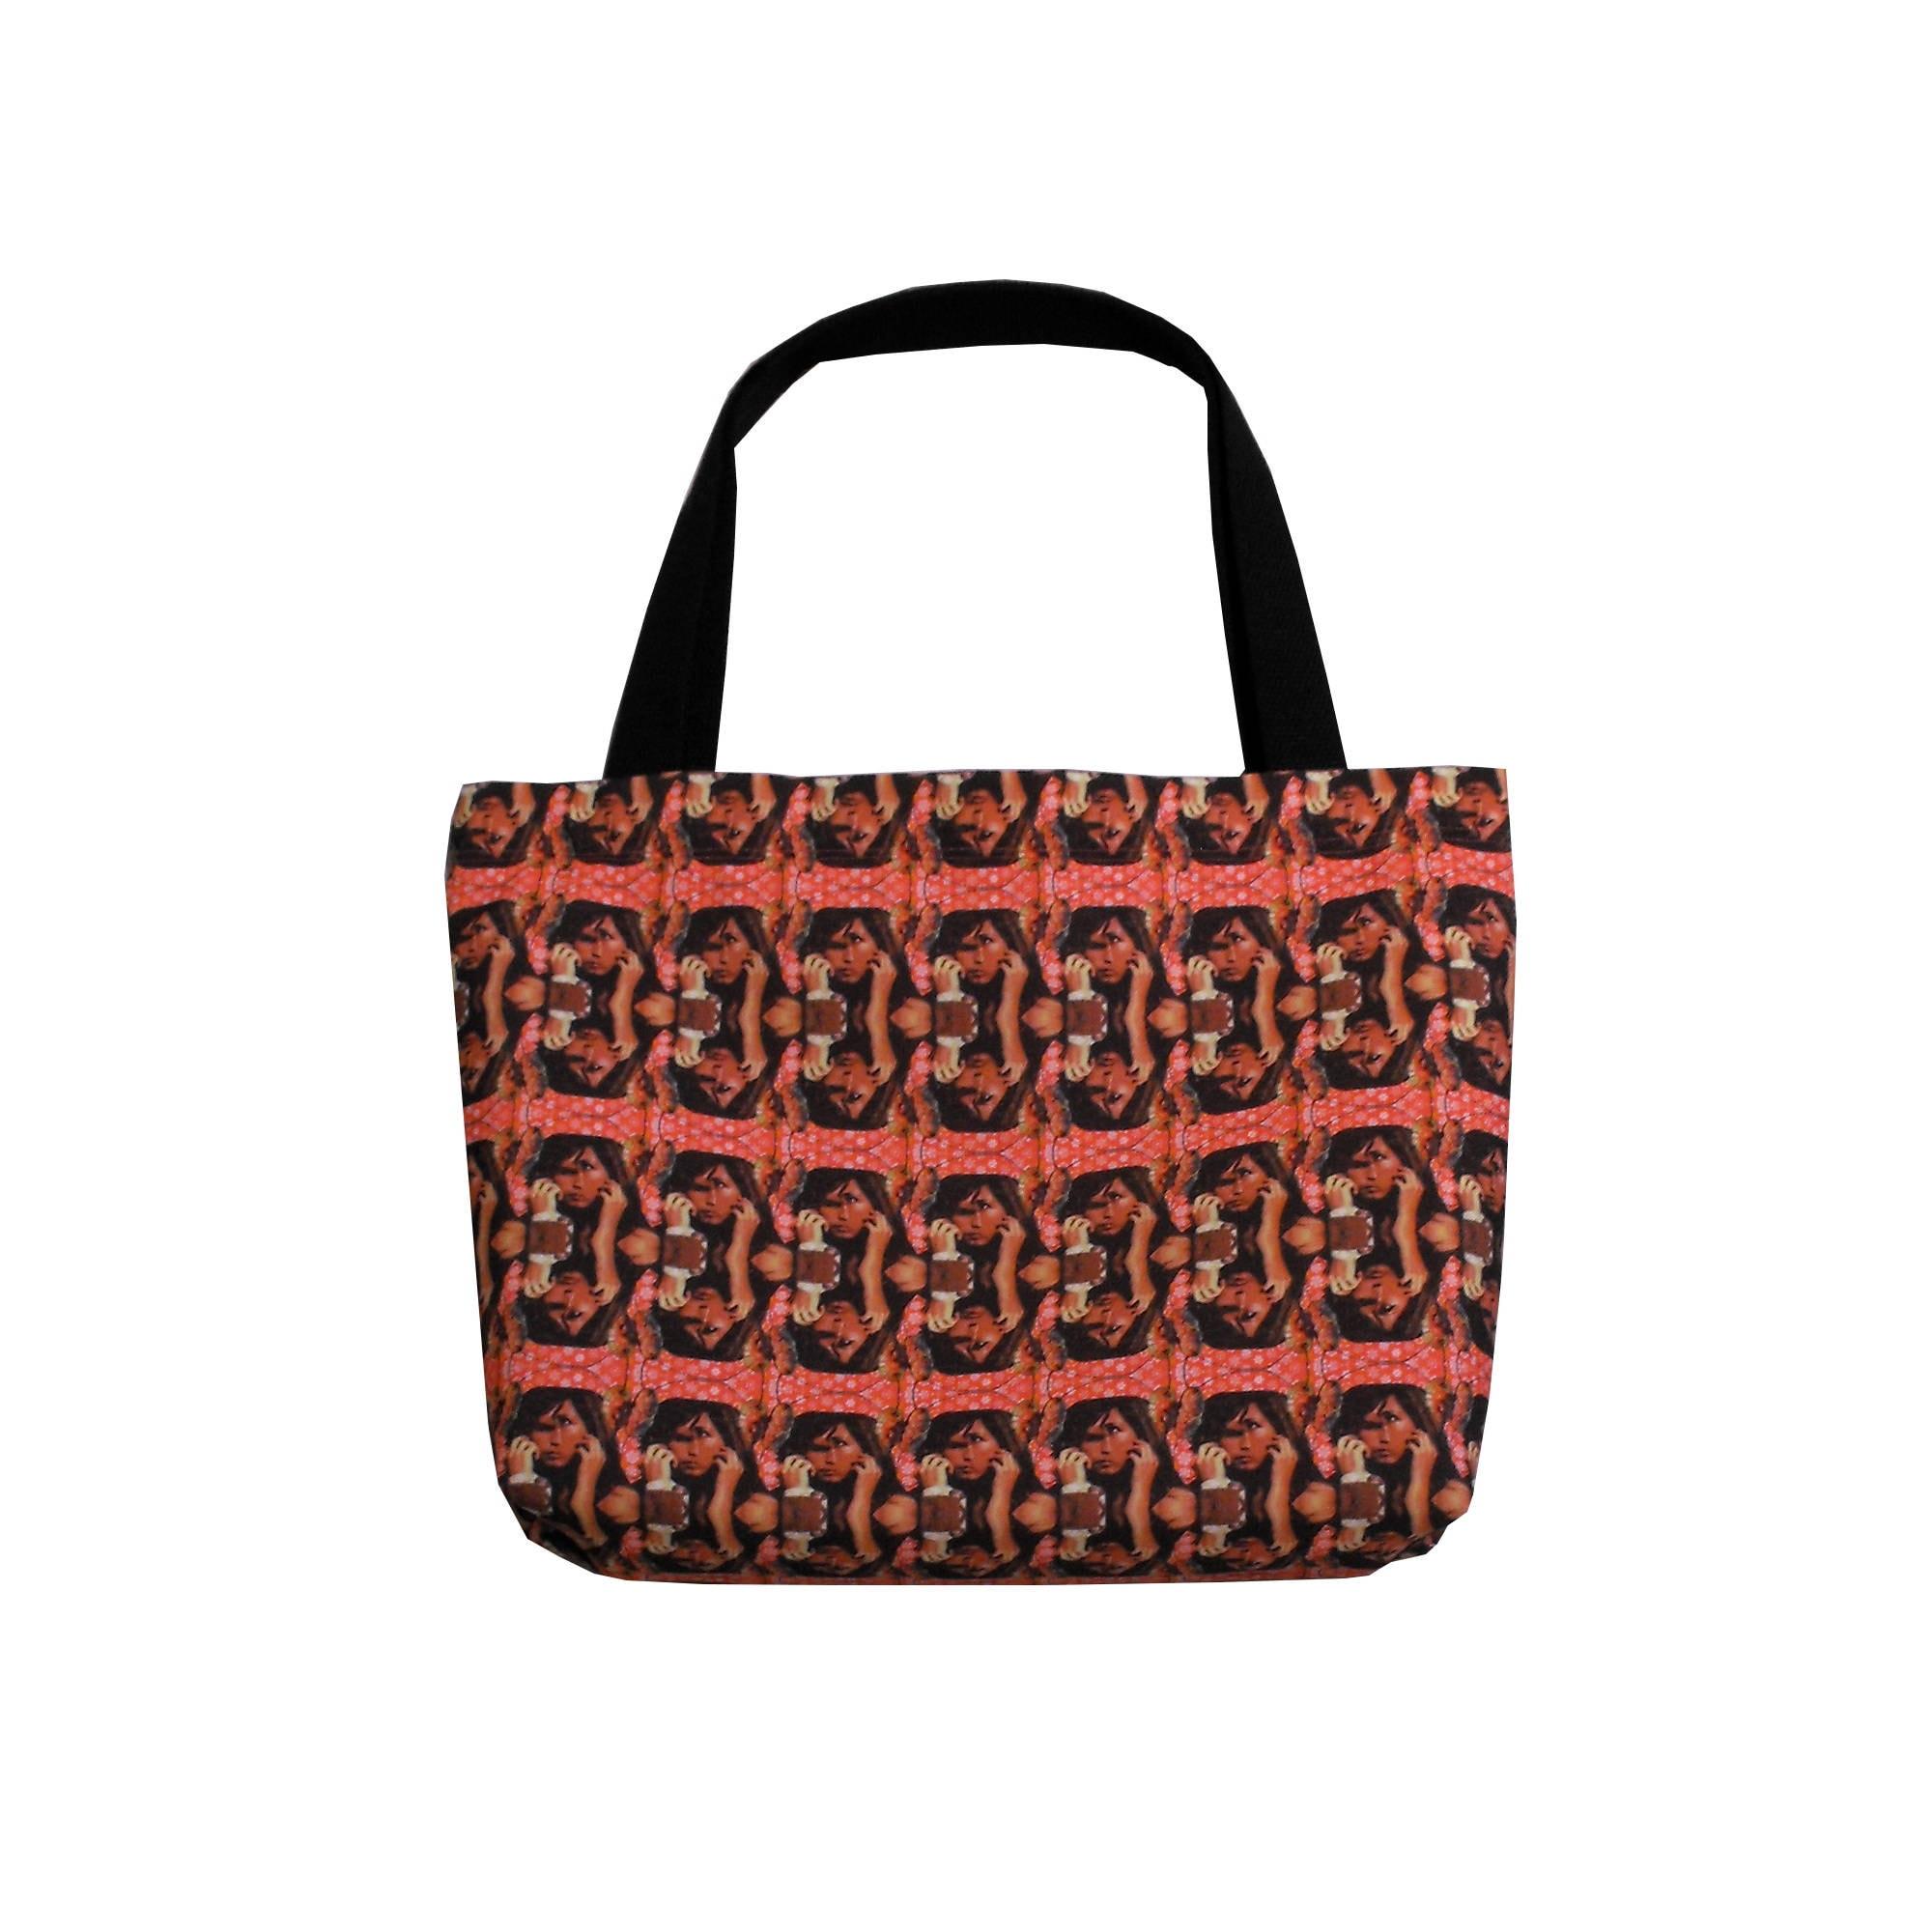 Psychedelic Art Handbag Slouchy Tote Bag Hobo Bag Canvas Tote  9d9c6488fcd5d